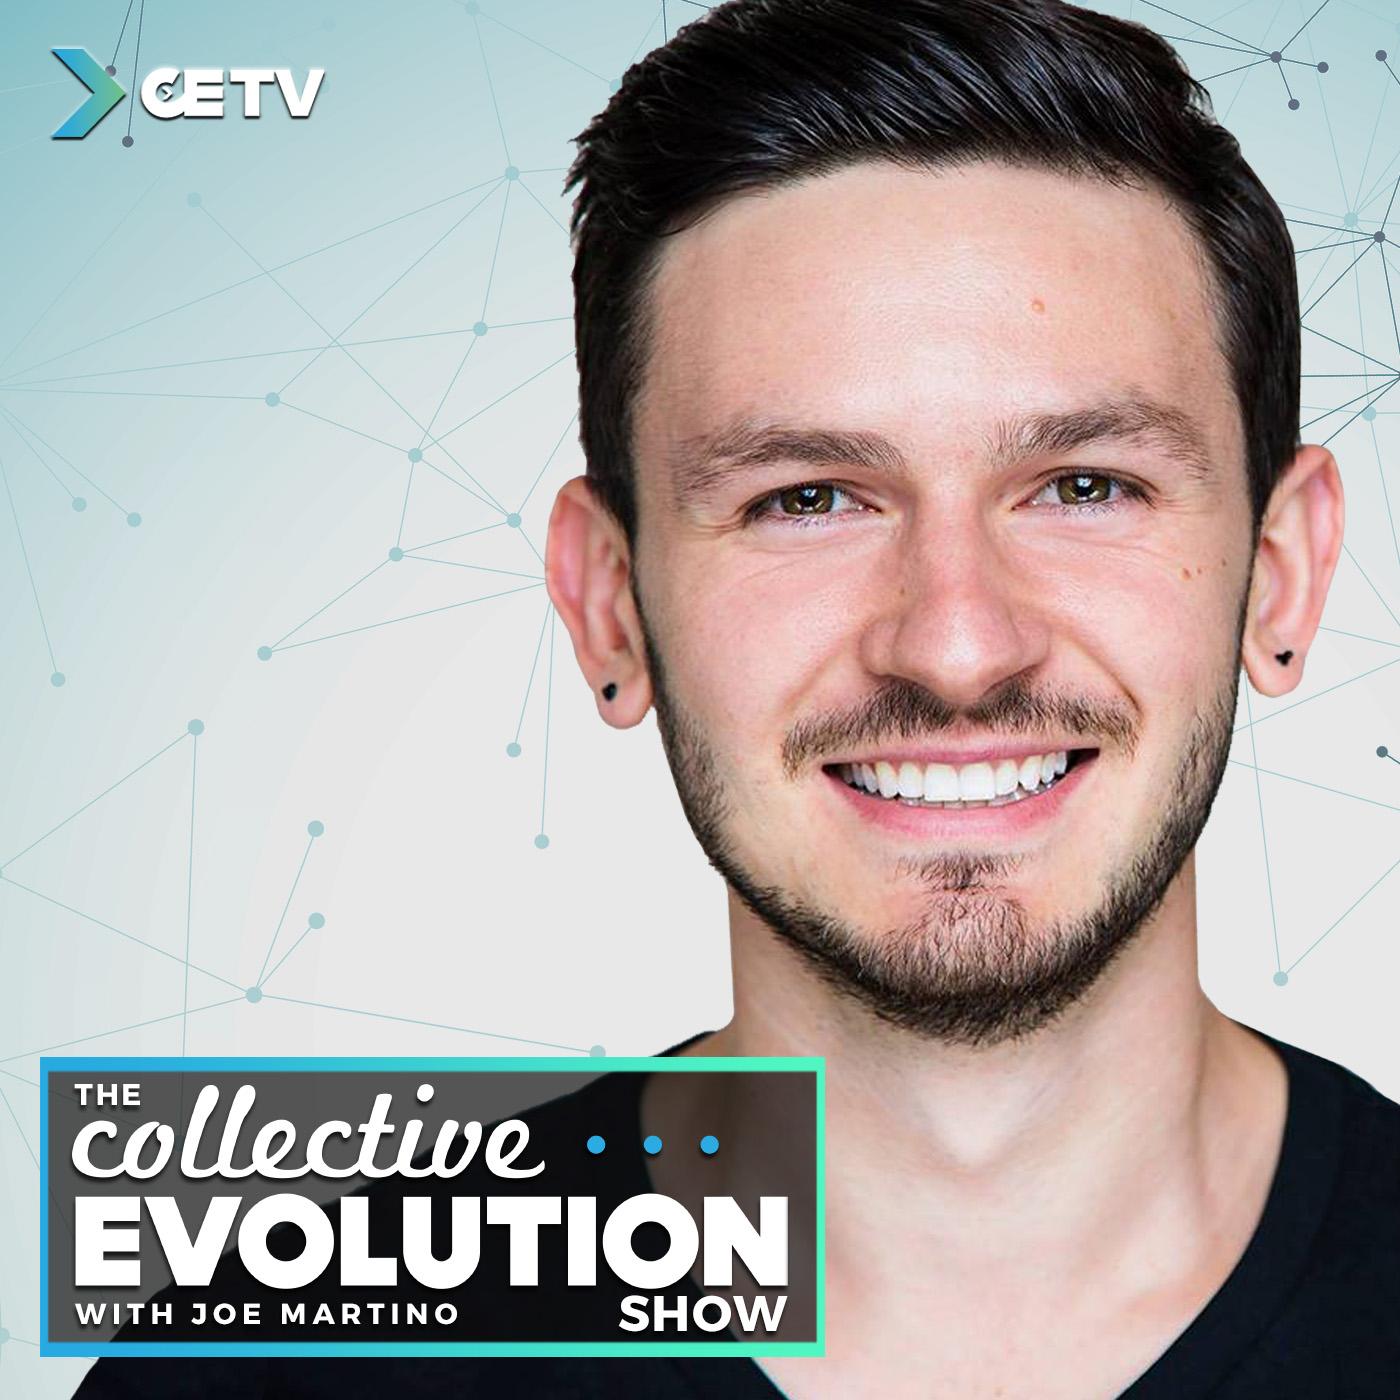 The Collective Evolution Show - With Joe Martino show art